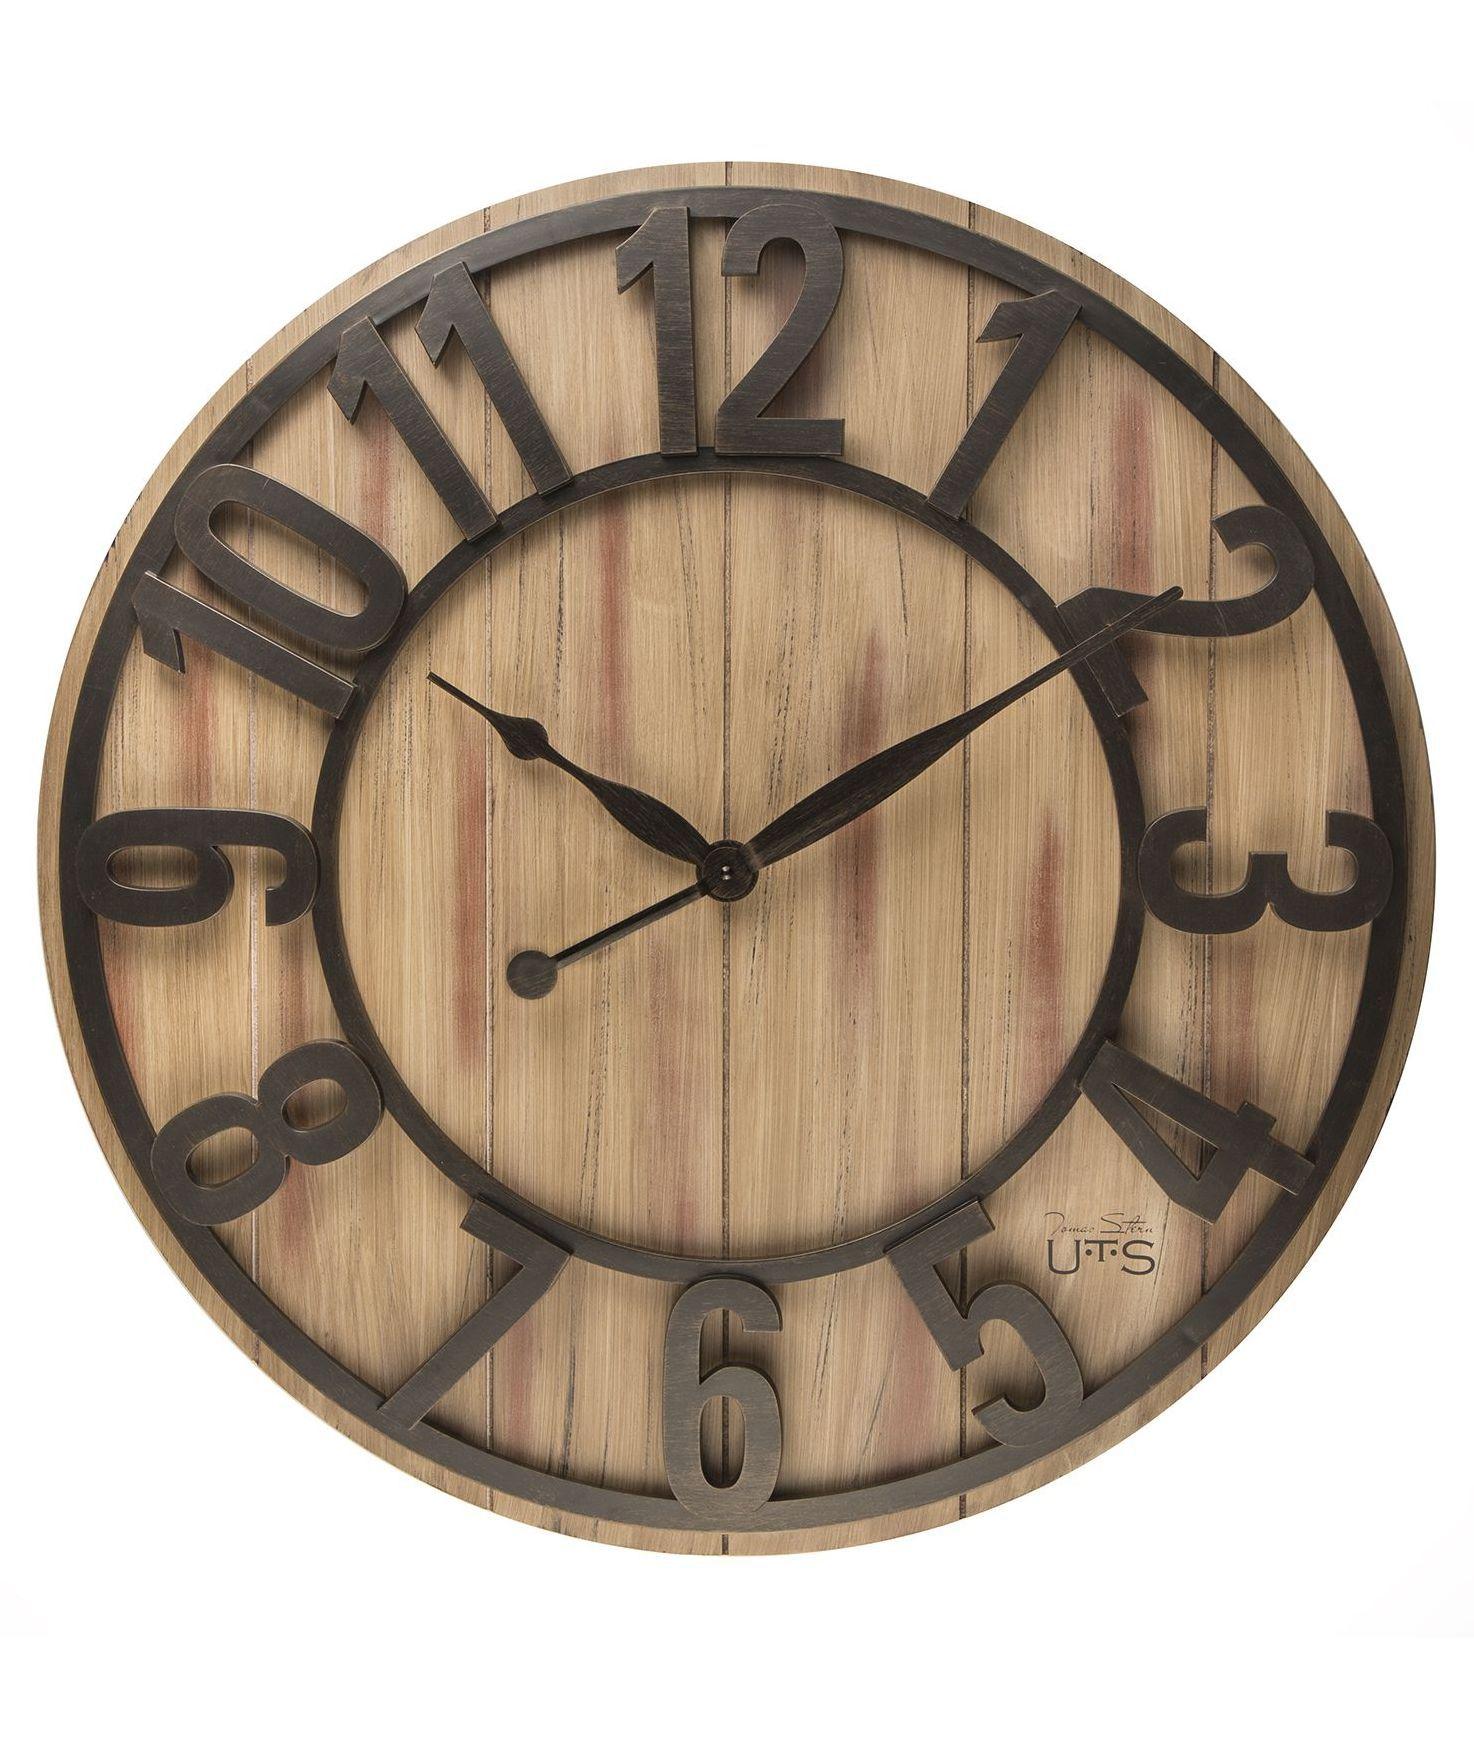 Часы настенные Часы настенные Tomas Stern 9017 chasy-nastennye-tomas-stern-9017-germaniya.jpg